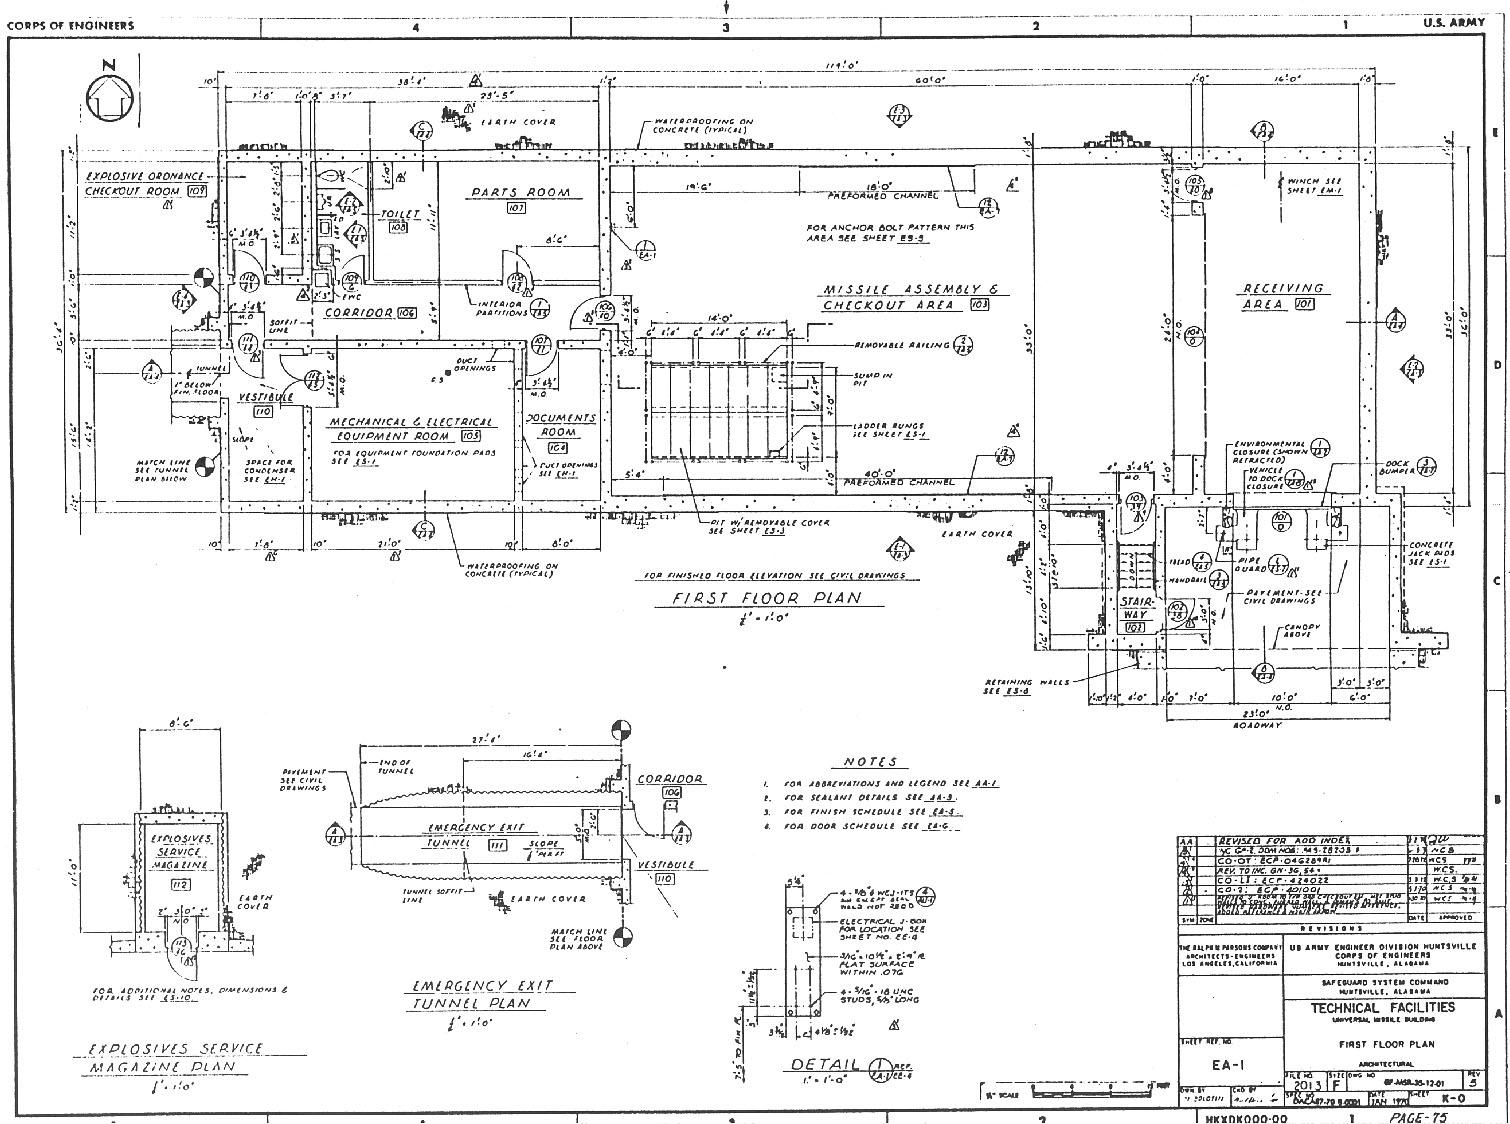 Msr Missile Support Haer Descriptions And Drawings